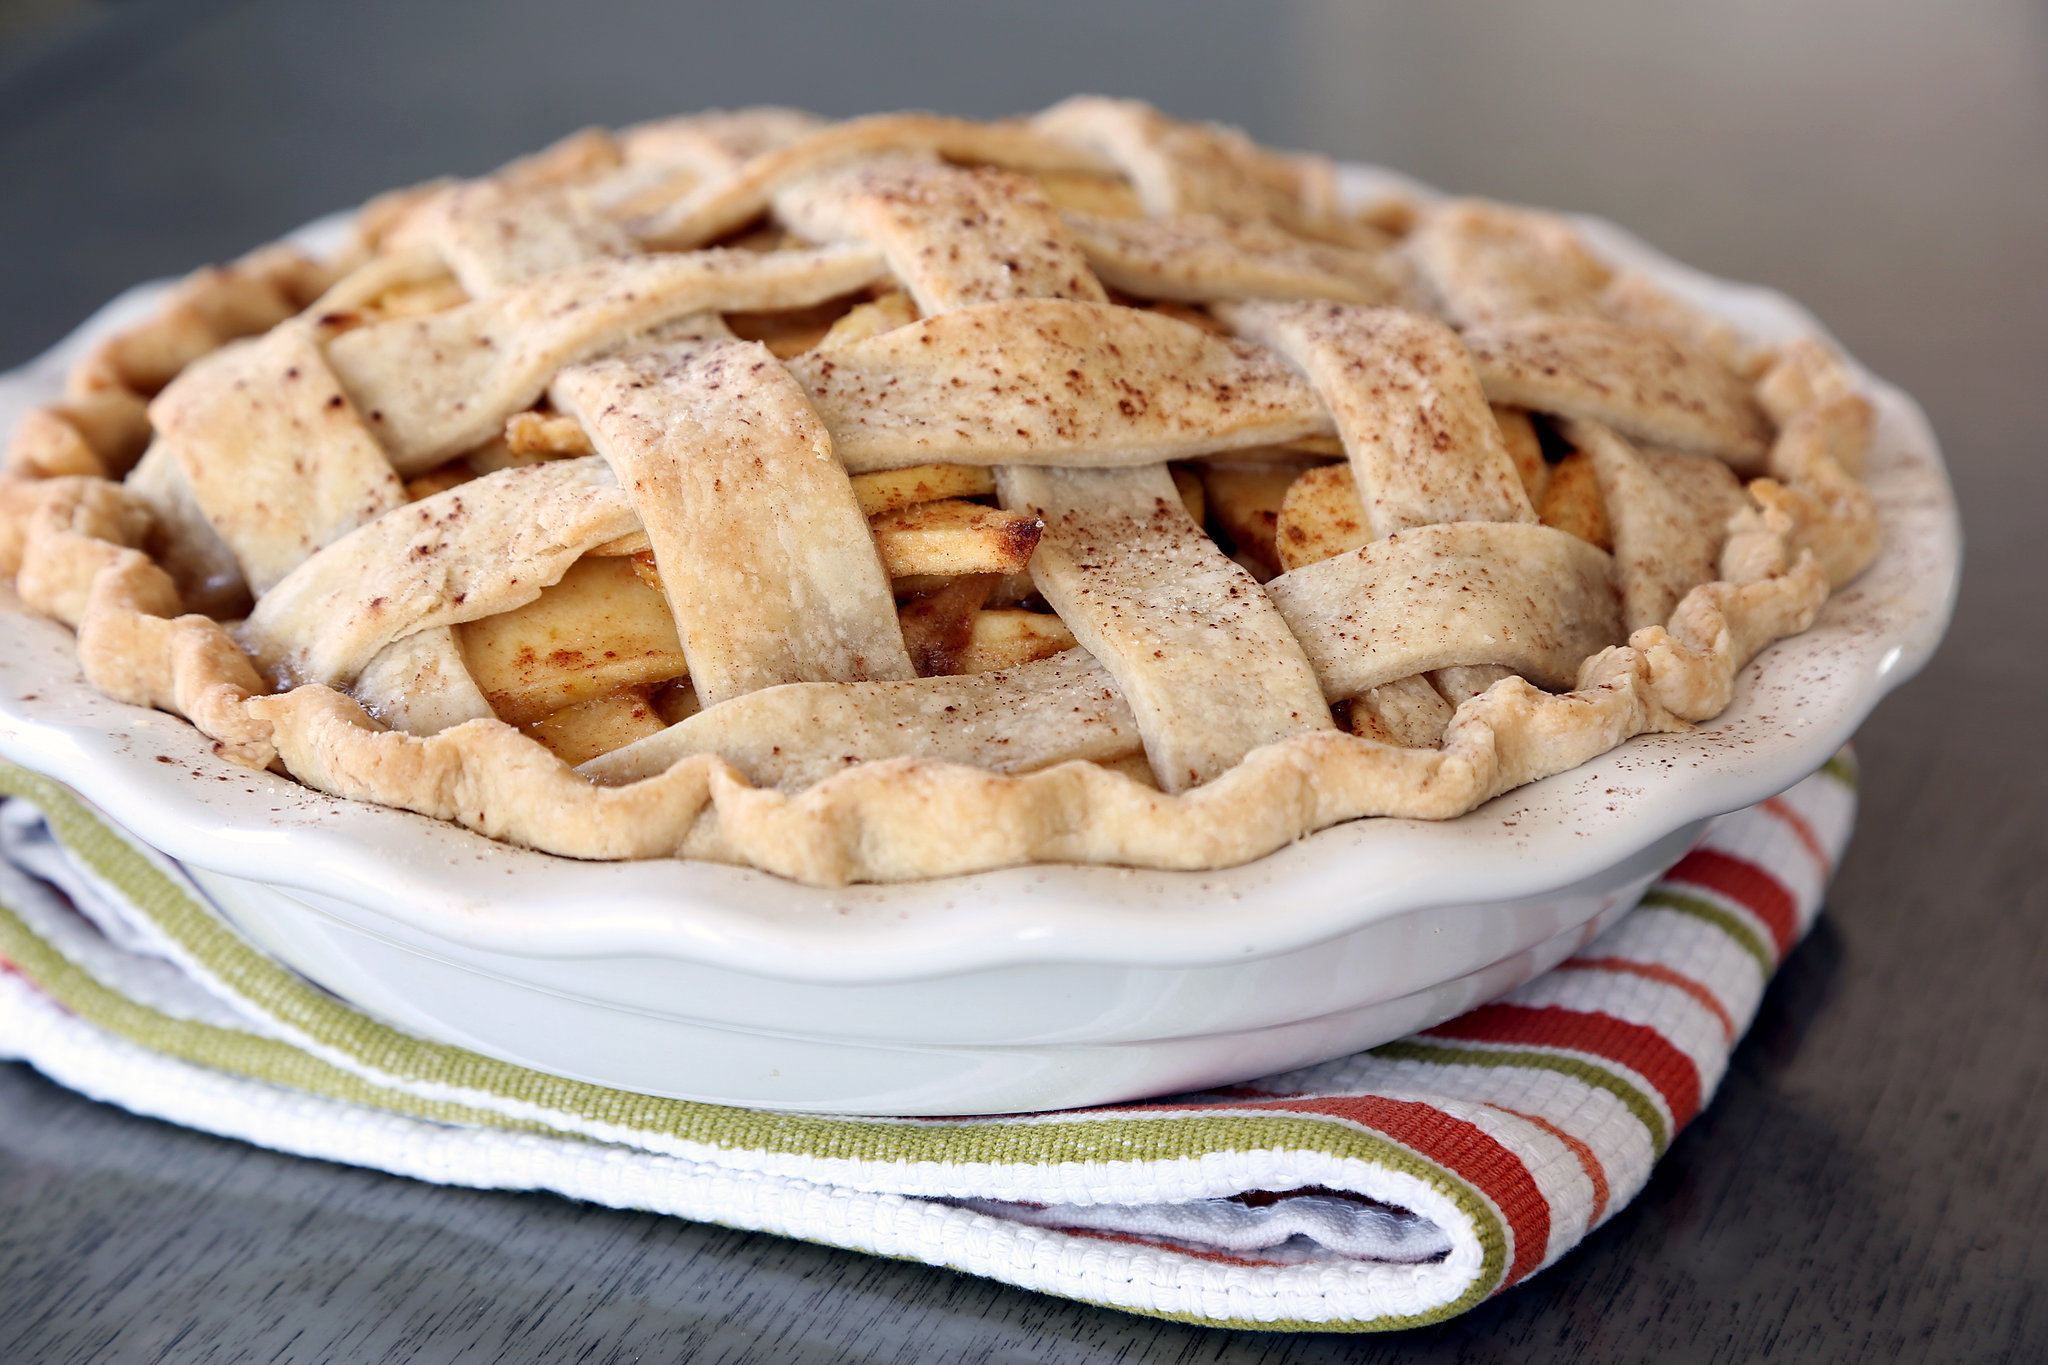 Apple Pie Recipe With Shortening Popsugar Food Watermelon Wallpaper Rainbow Find Free HD for Desktop [freshlhys.tk]